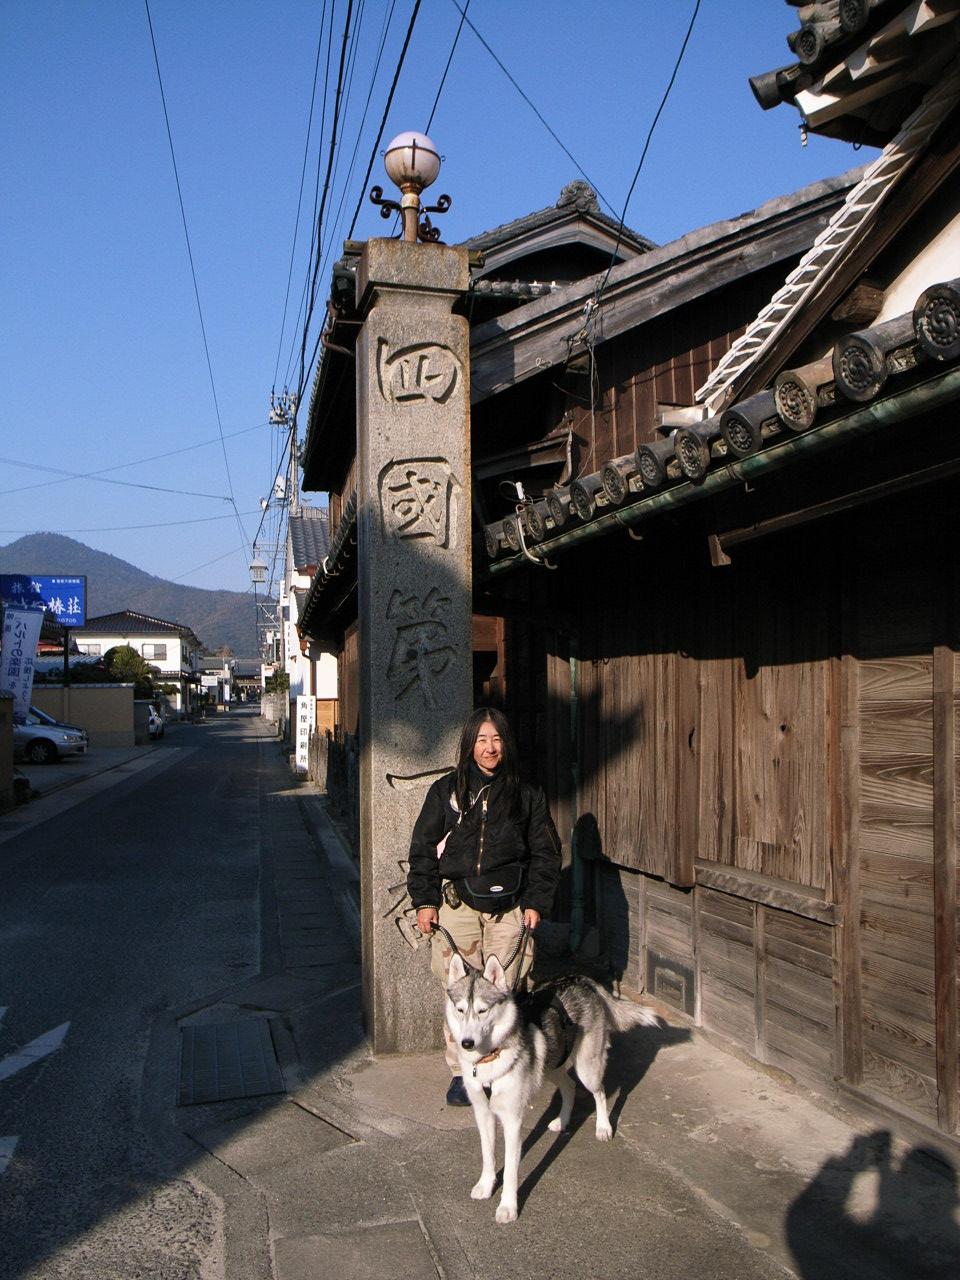 Shikoku Pilgrimage with Hana2  Dec.25th 2005_c0049299_14252.jpg